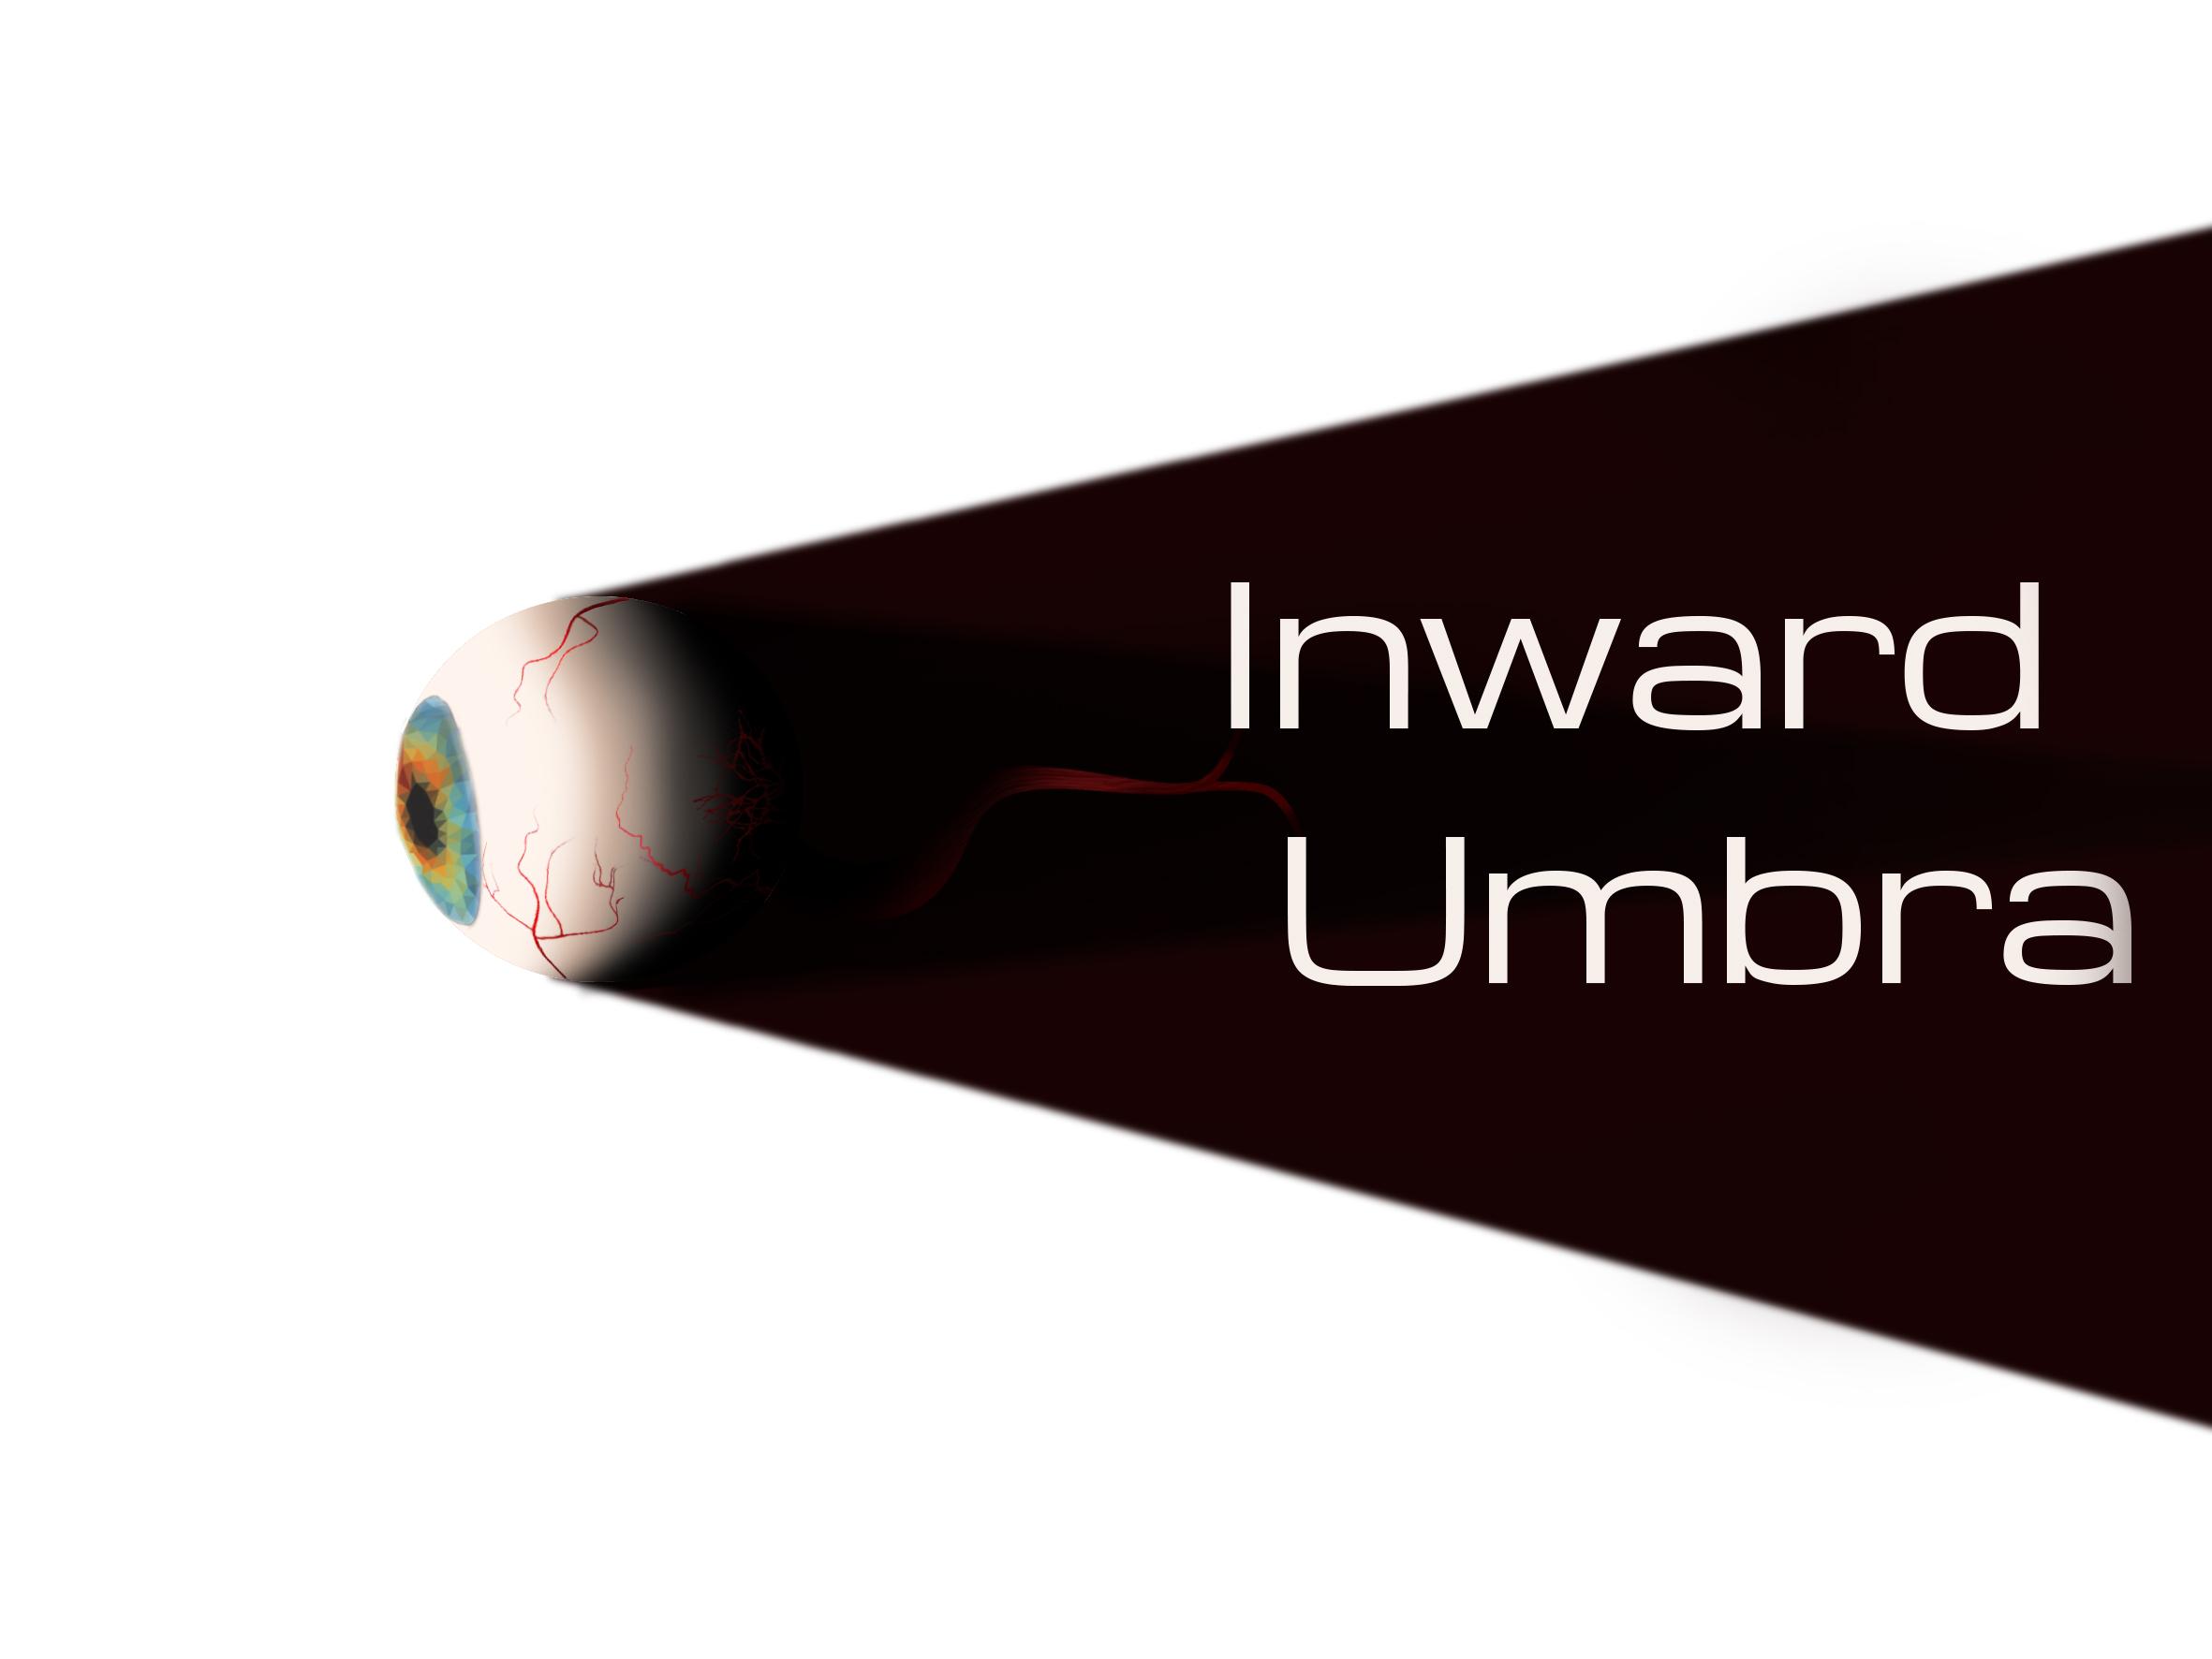 Inward Umbra